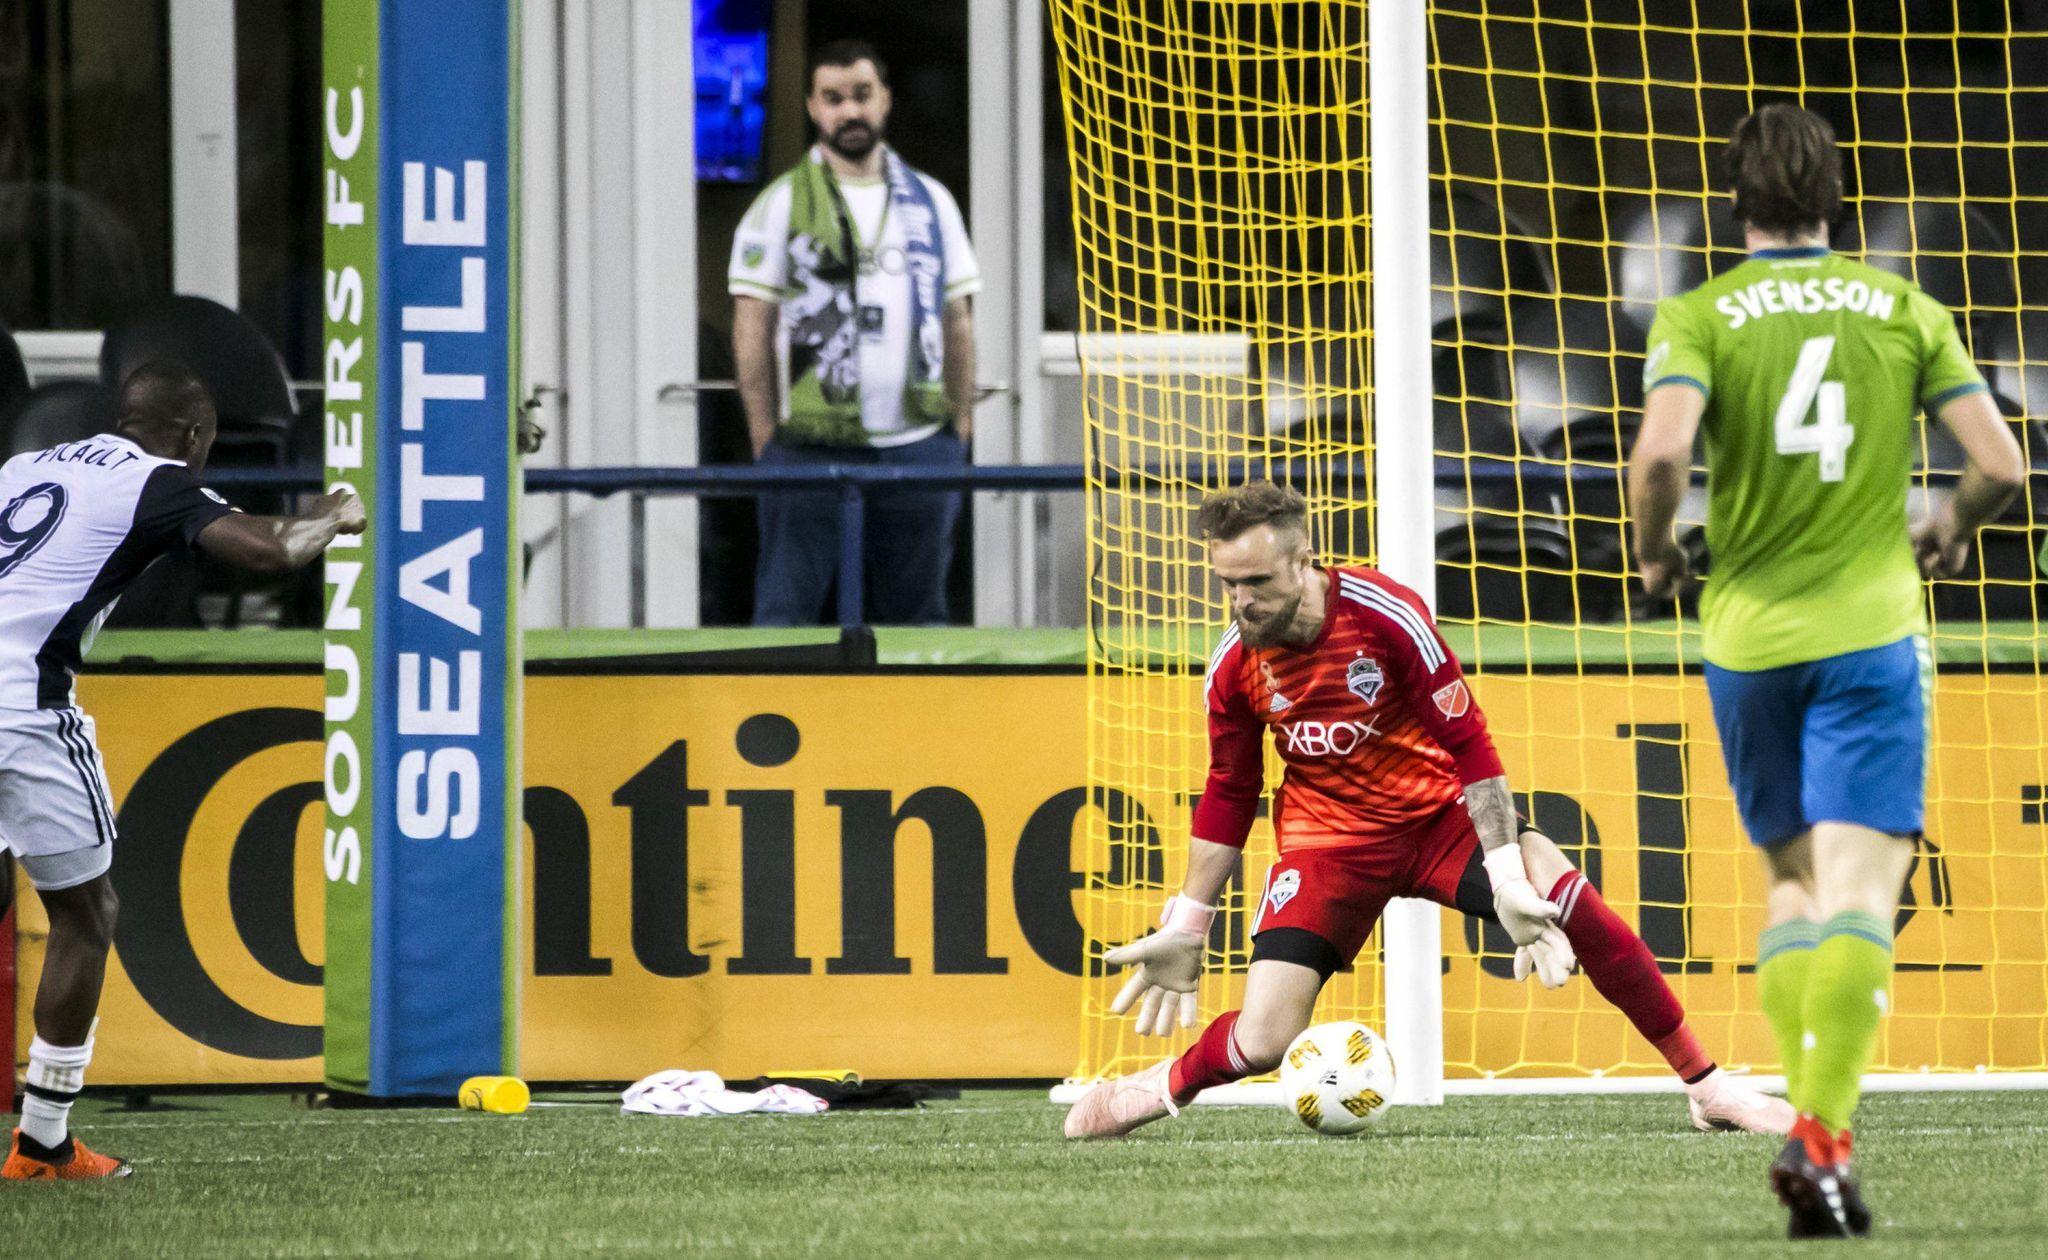 Picault's late goal helps Union end Sounders' win streak - Washington Times